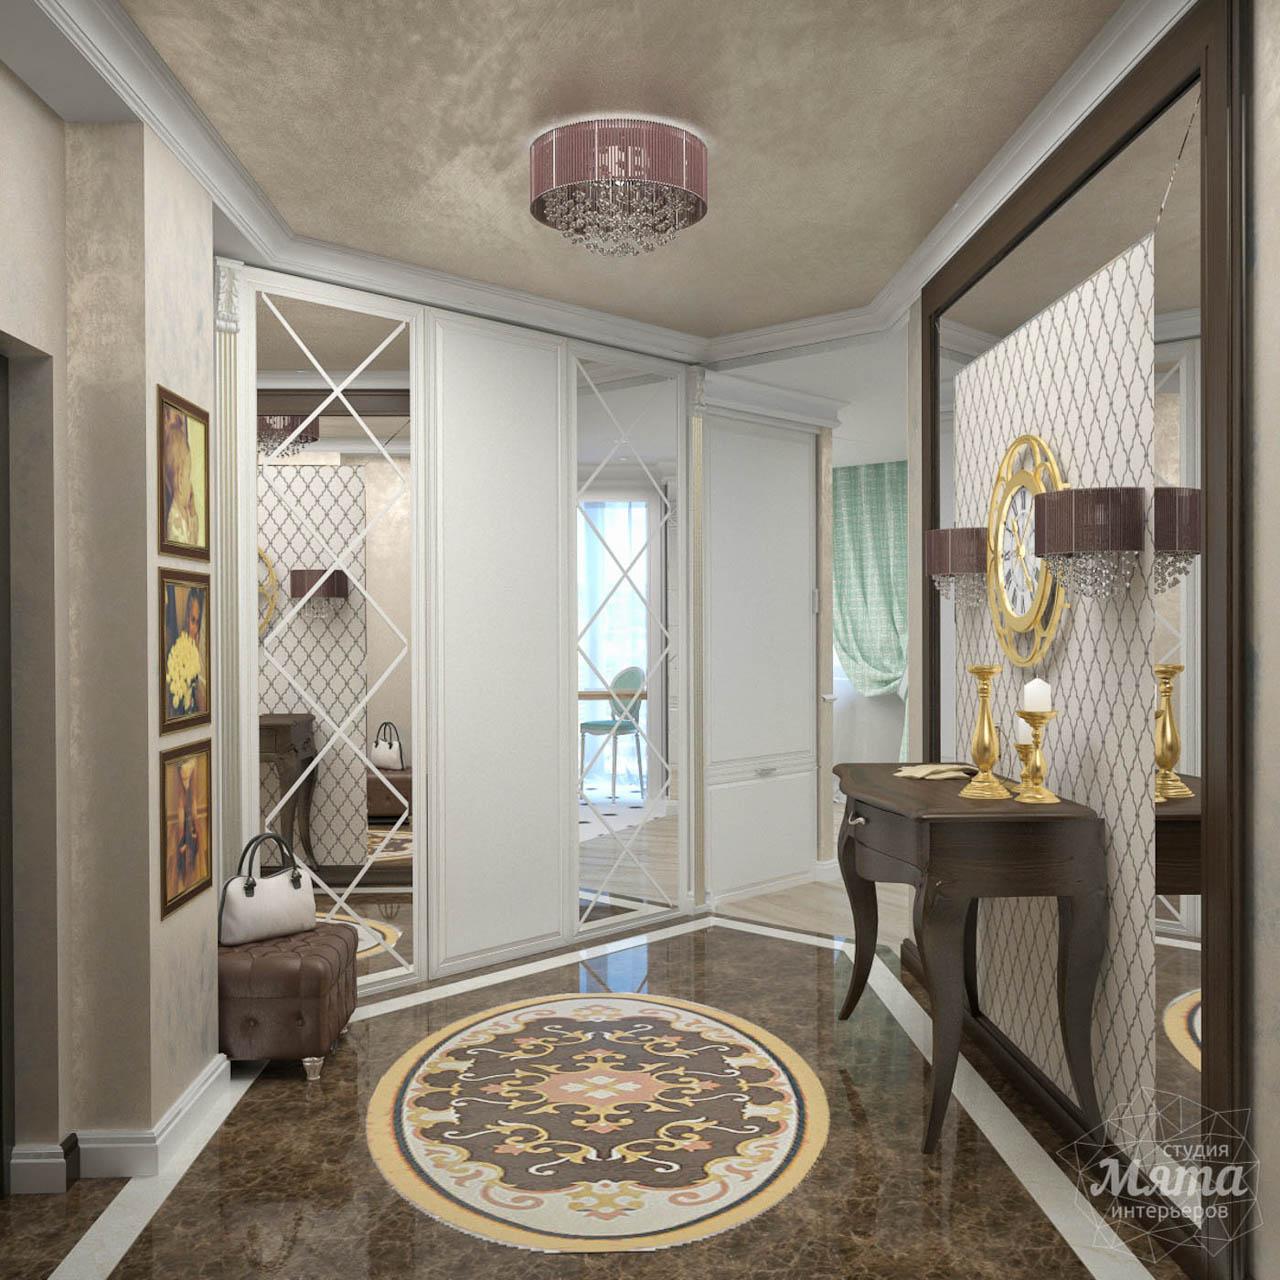 Дизайн интерьера и ремонт трехкомнатной квартиры по ул. 8 Марта 190 img241129777